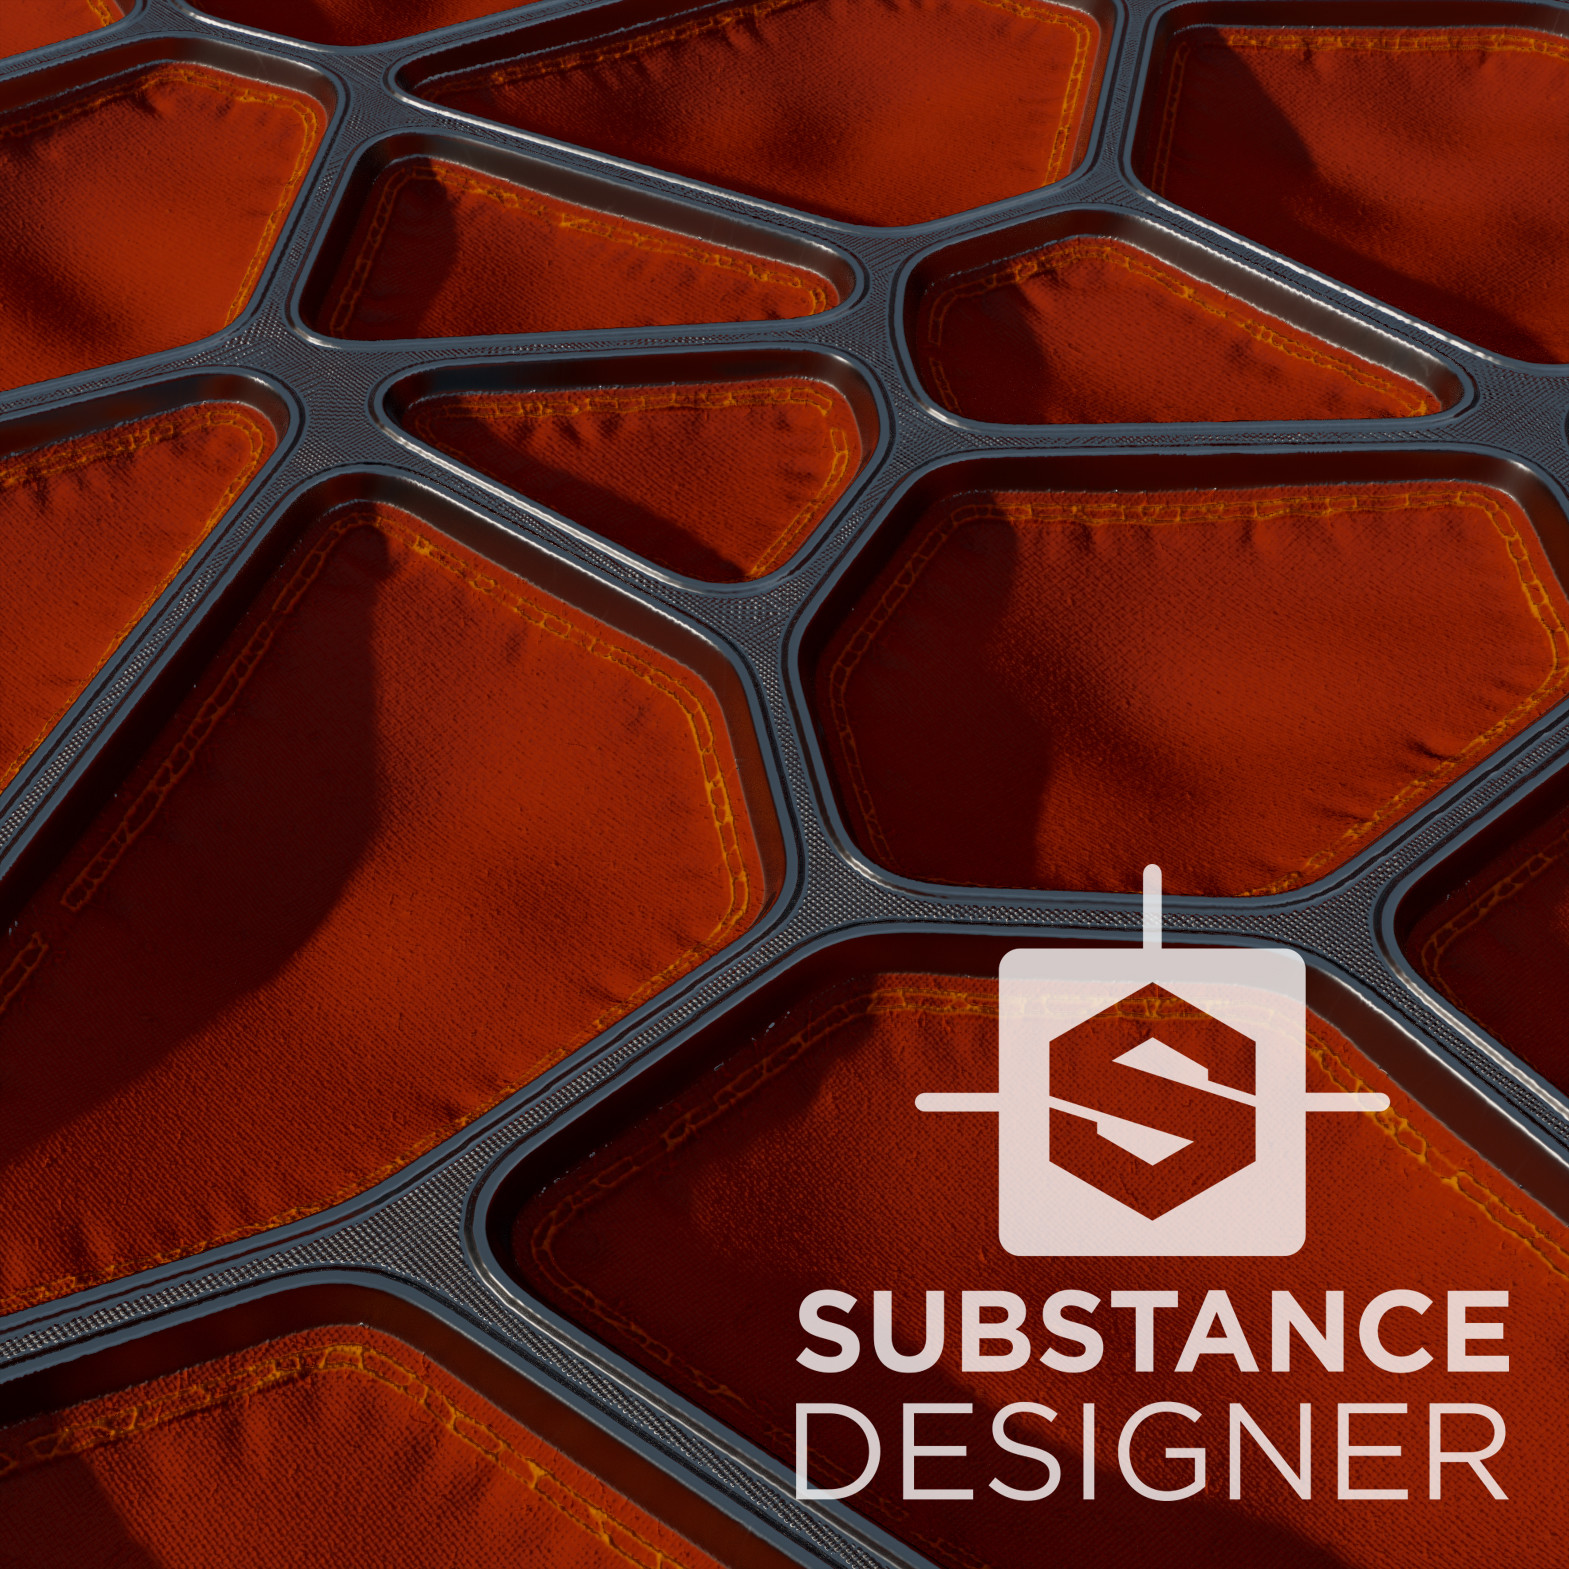 Random_Stuff_01 - 100% procedural, done in Substance Designer